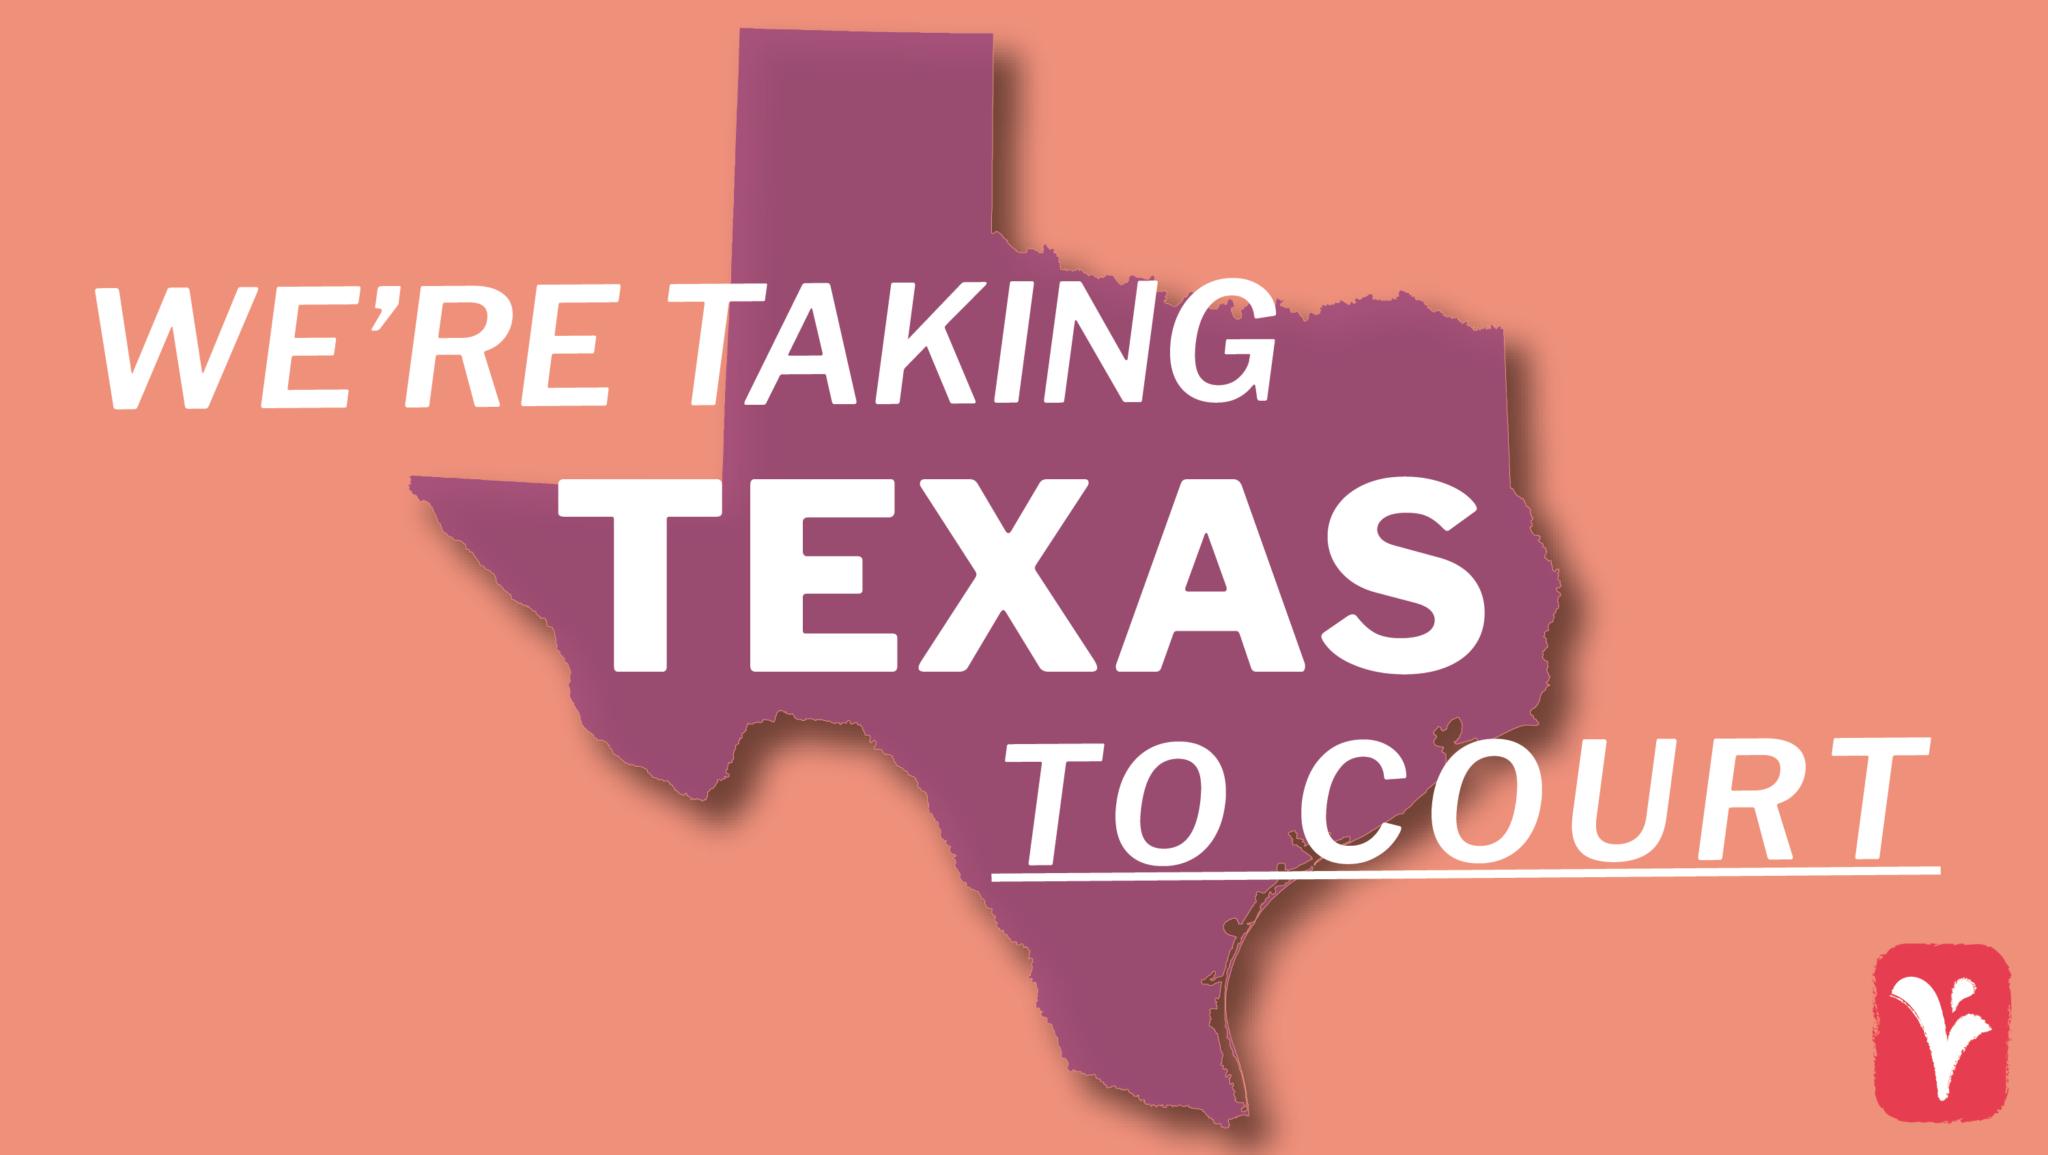 SB8 Texas Abortion Ban